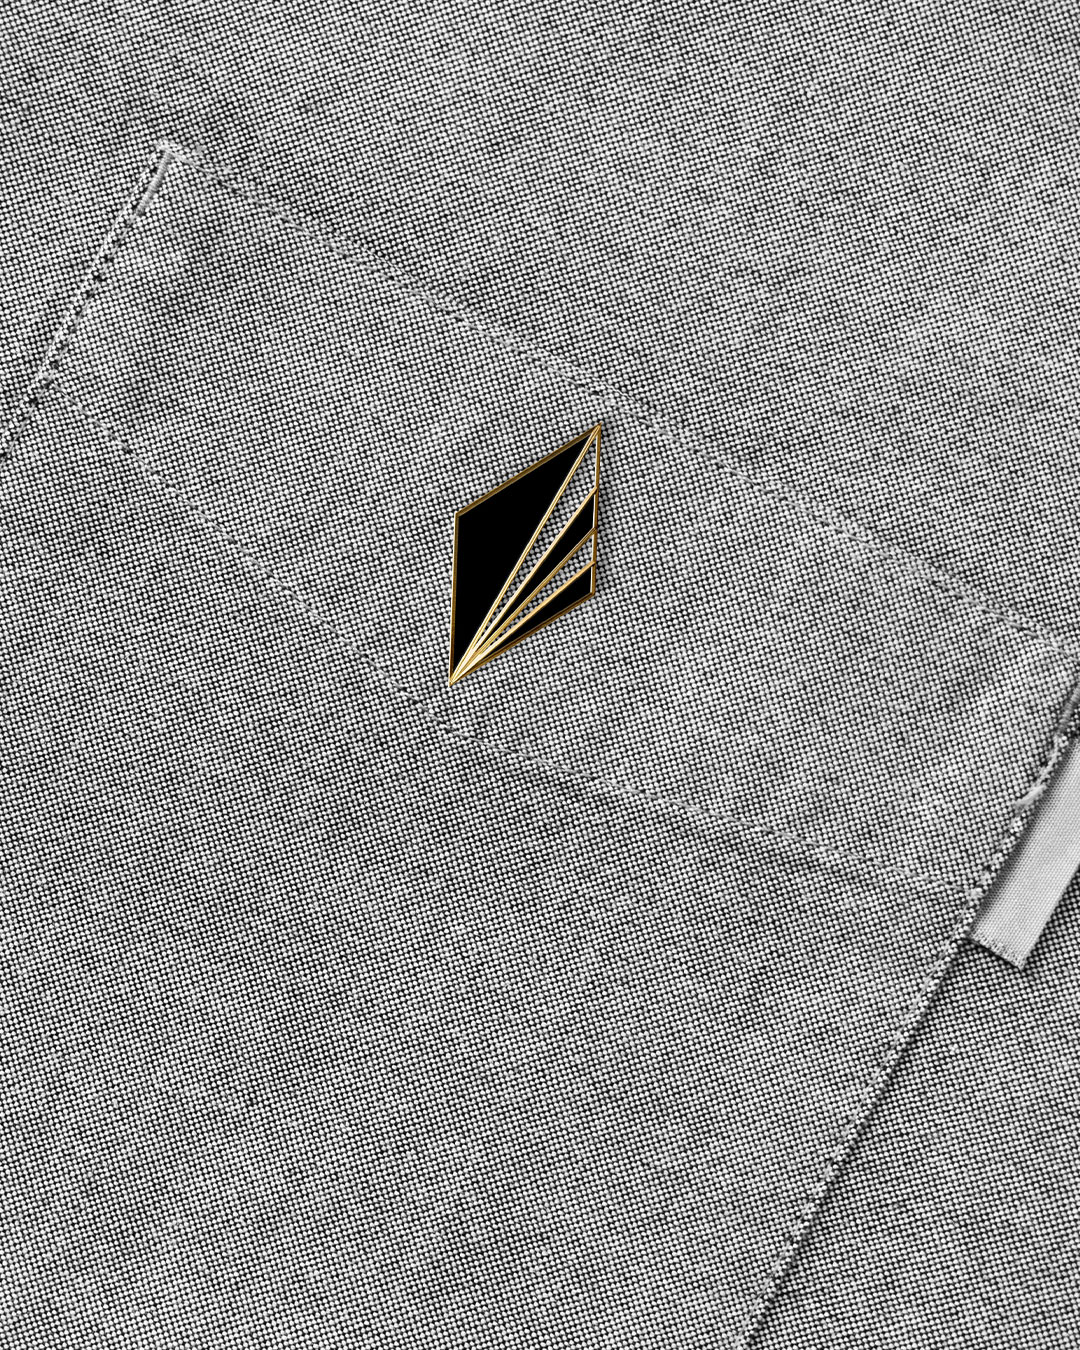 Jean-Luc De Wachter Personal Branding, Designed by Marquer Le Futur